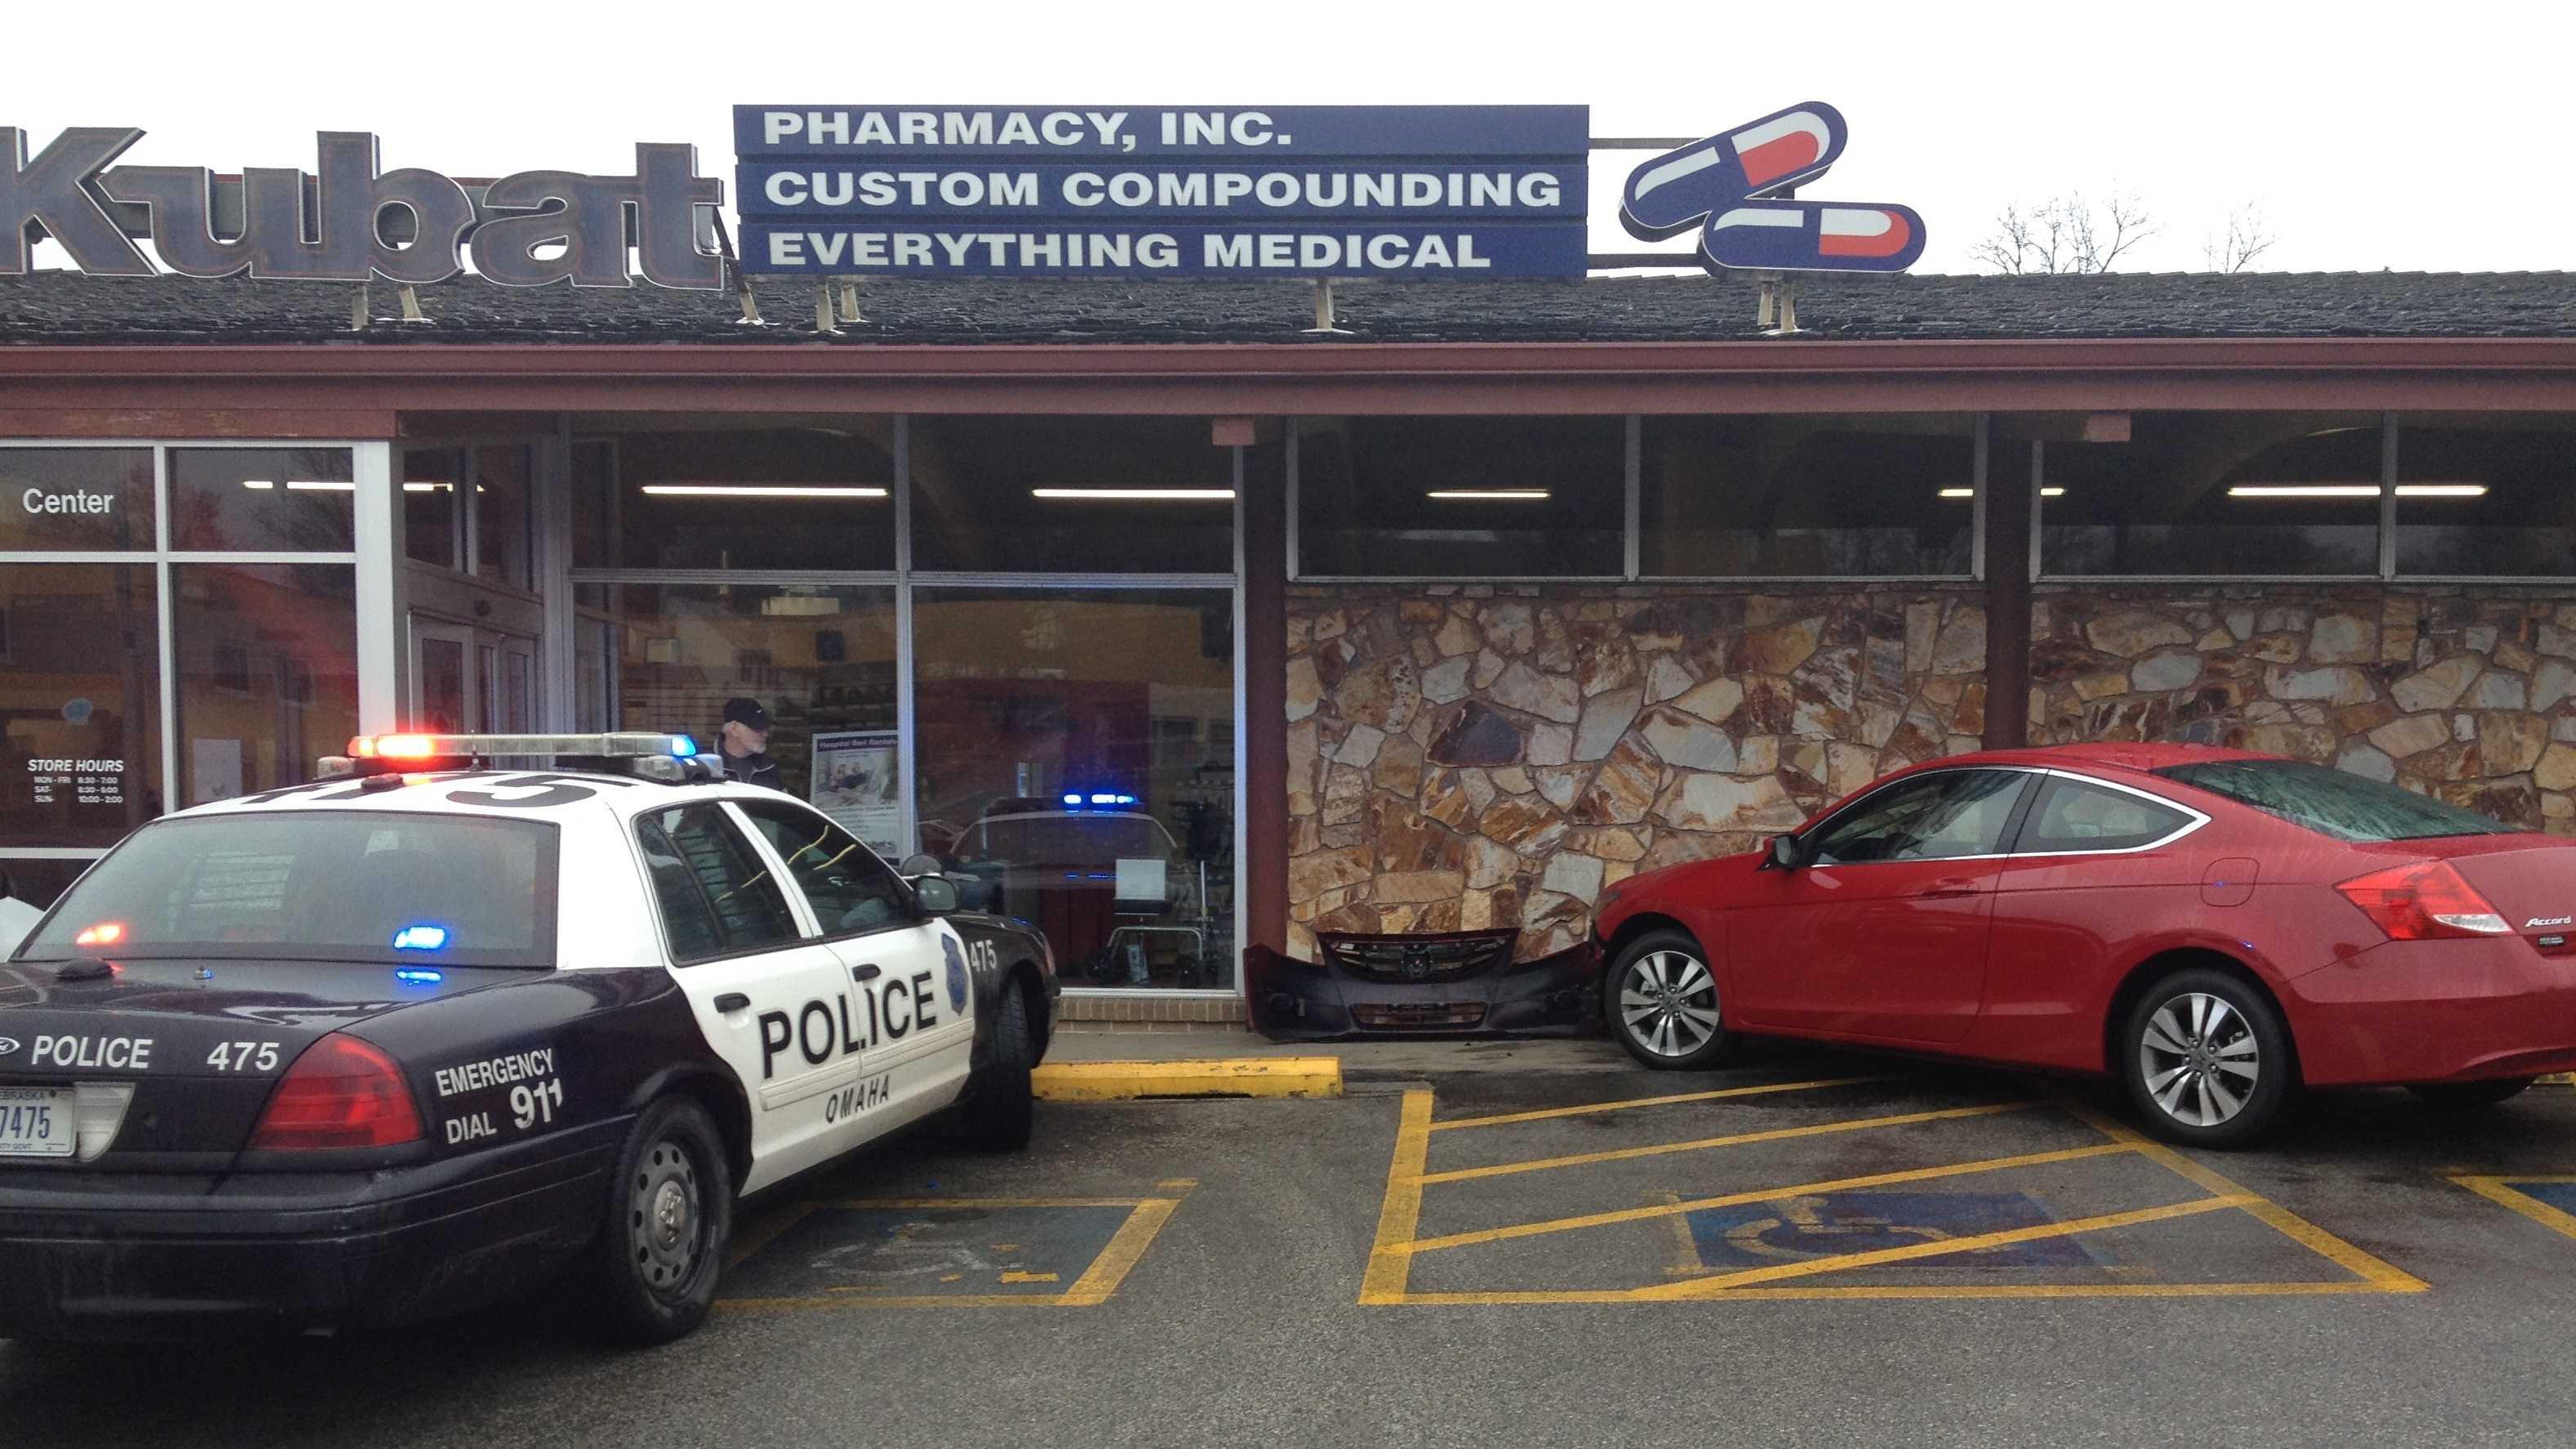 Kubat-Pharmacy.JPG